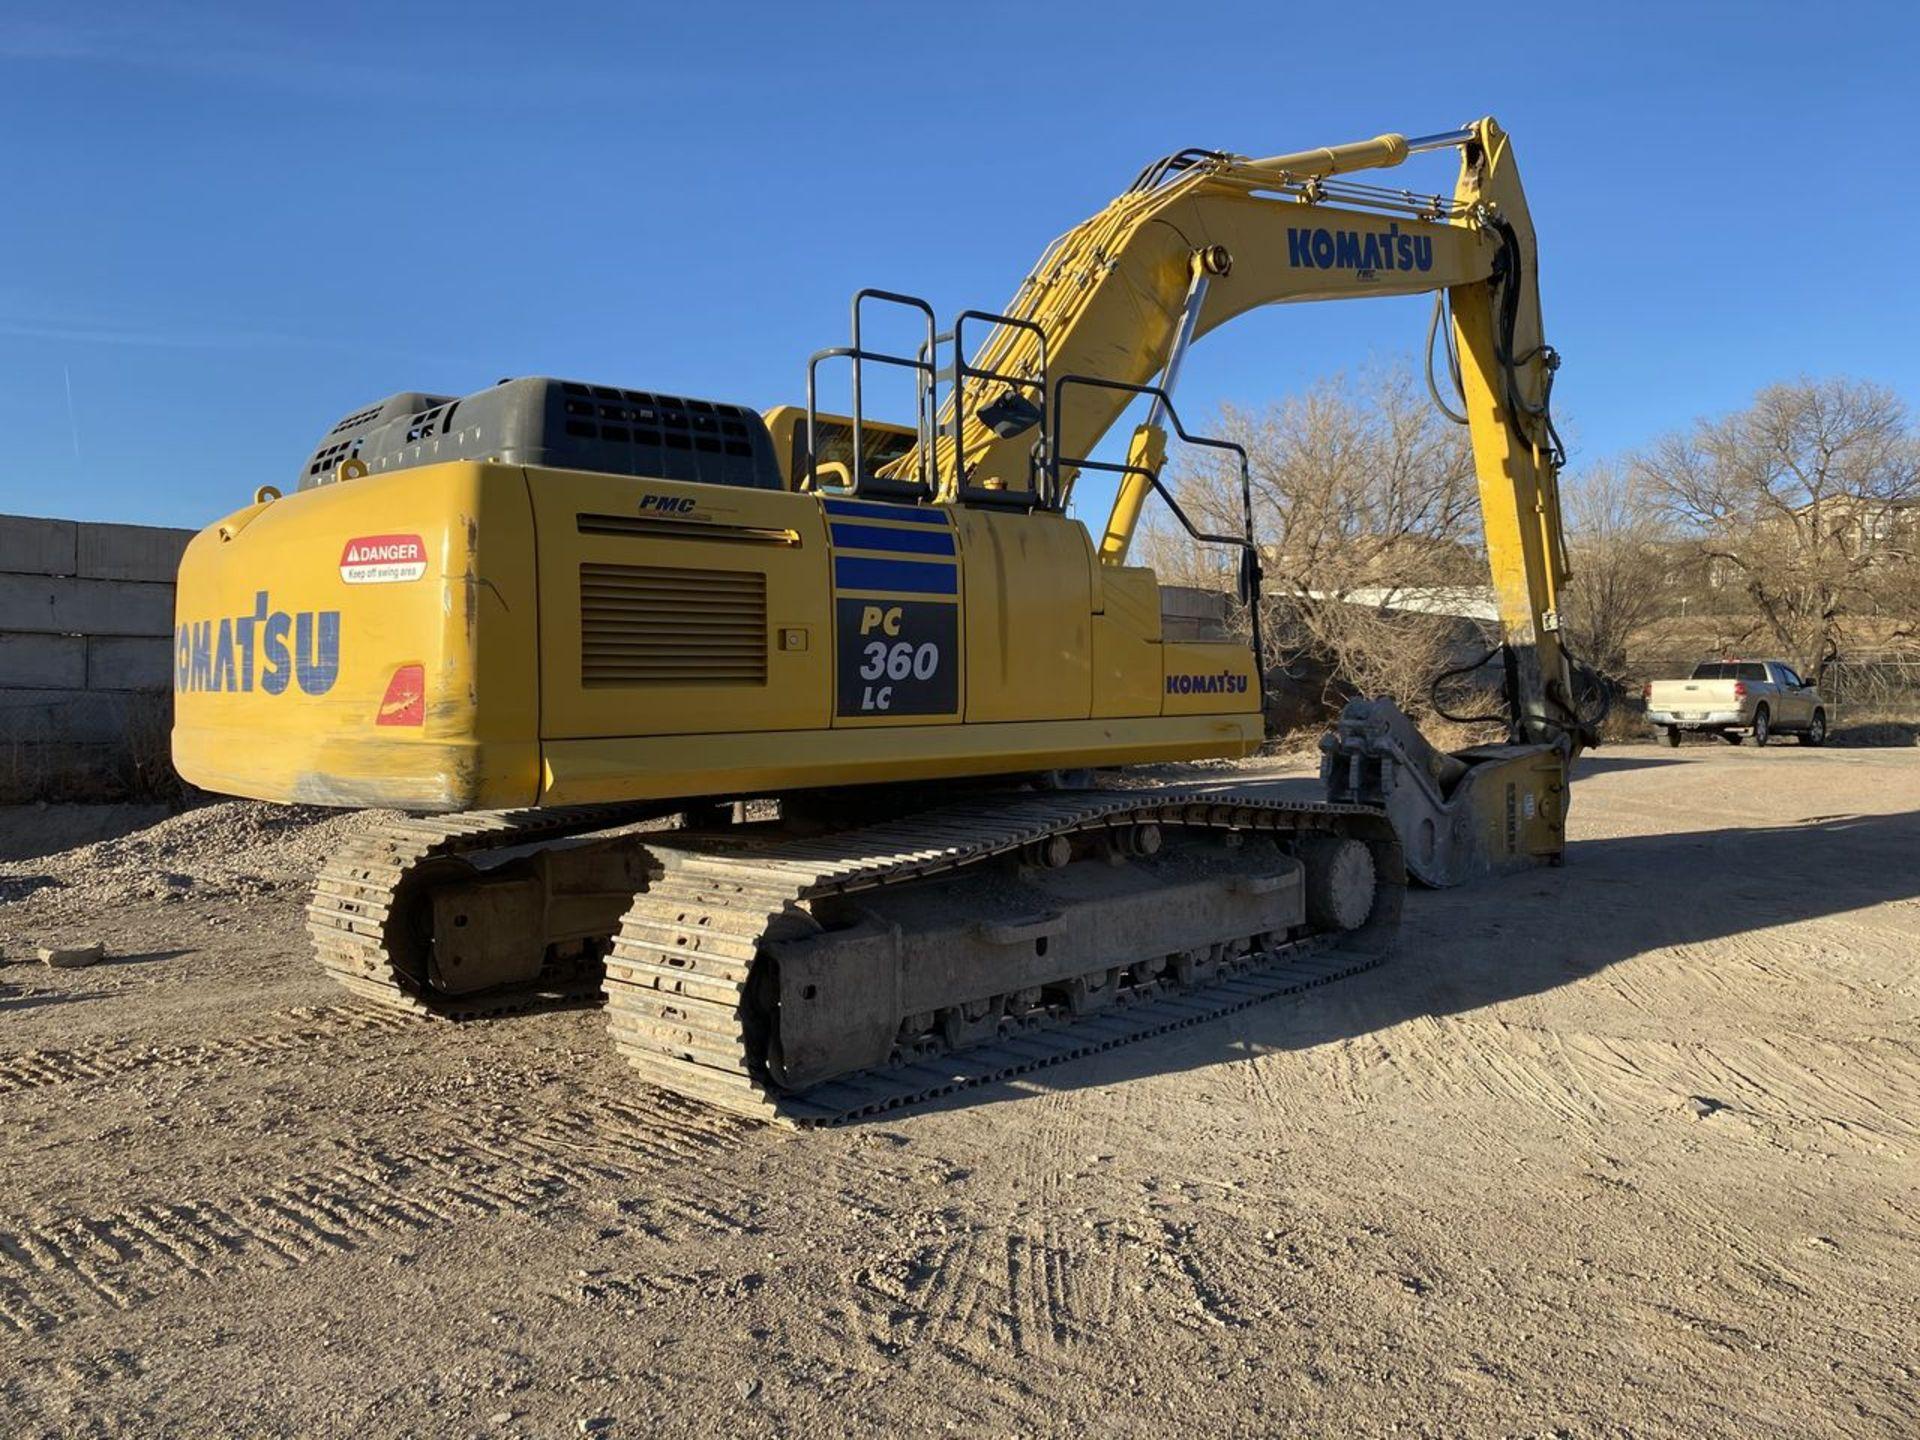 2018 Komatsu PC360LC-11 Hydraulic Crawler Excavator, S/N: A36863, PIN: KMTPC256CJWA36863; with 2,883 - Image 13 of 19